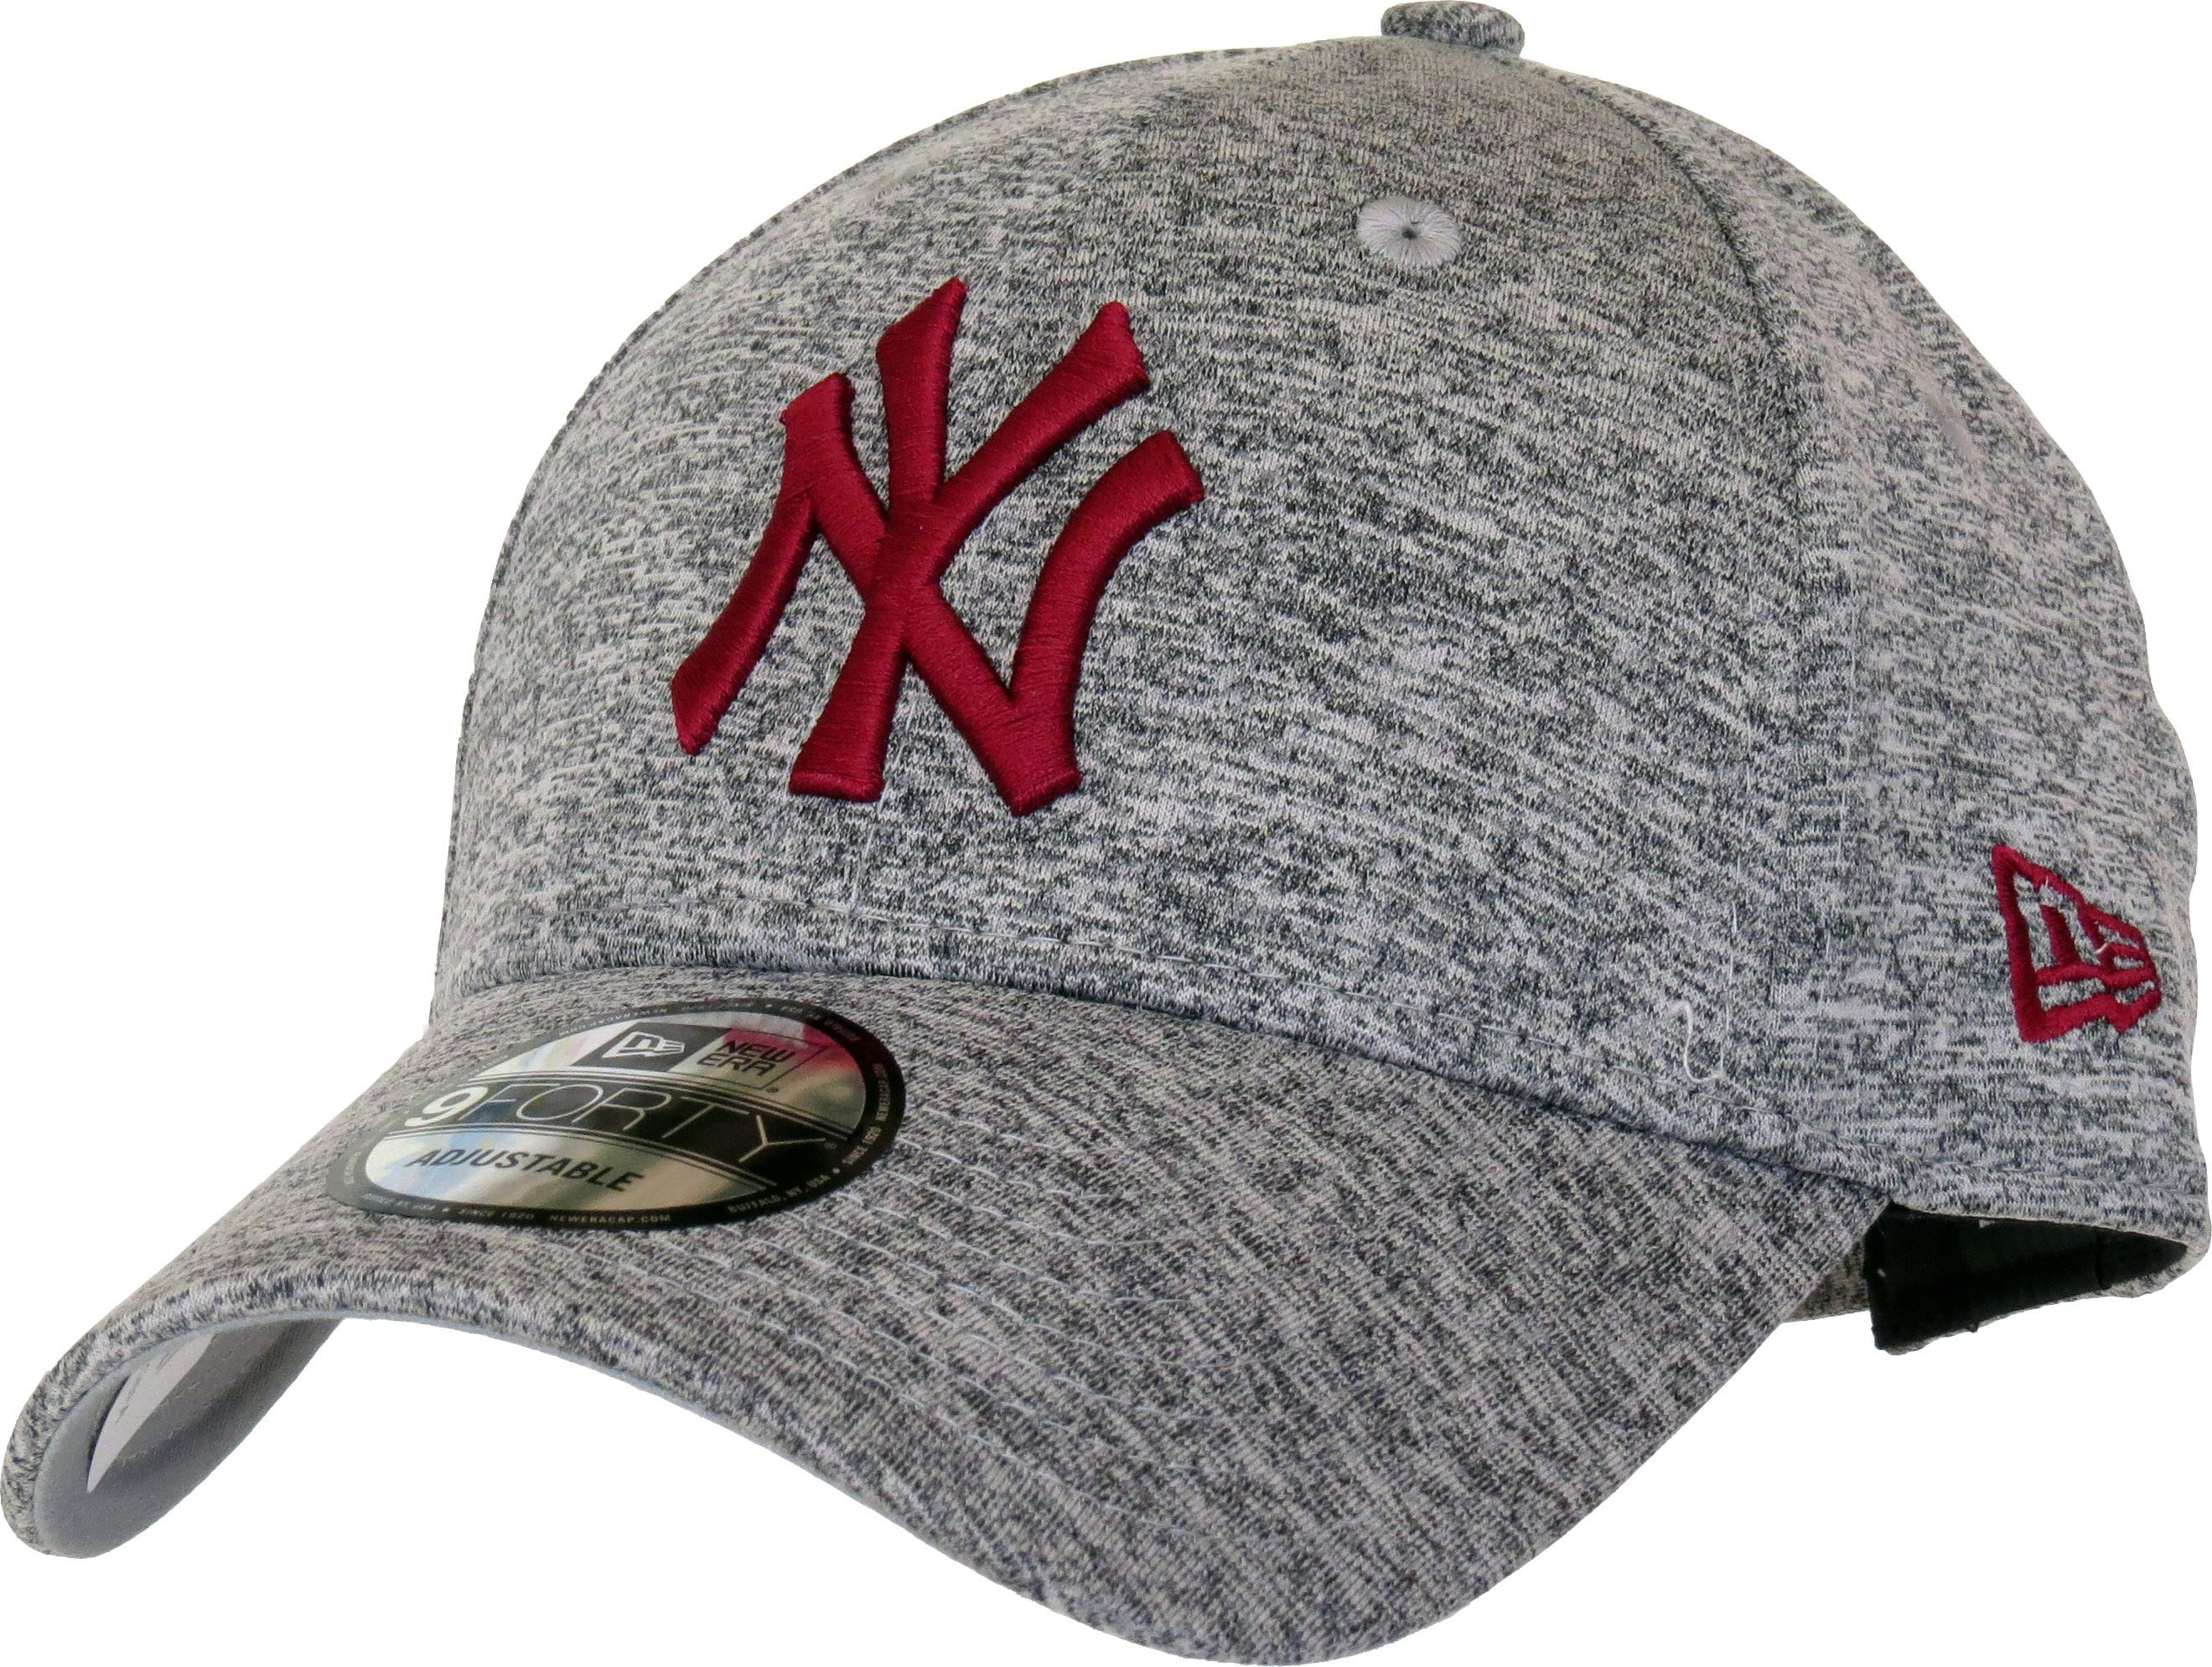 59bbec4a New Era 9Forty New York Yankees Tech Jersey Adjustable Baseball Cap ...